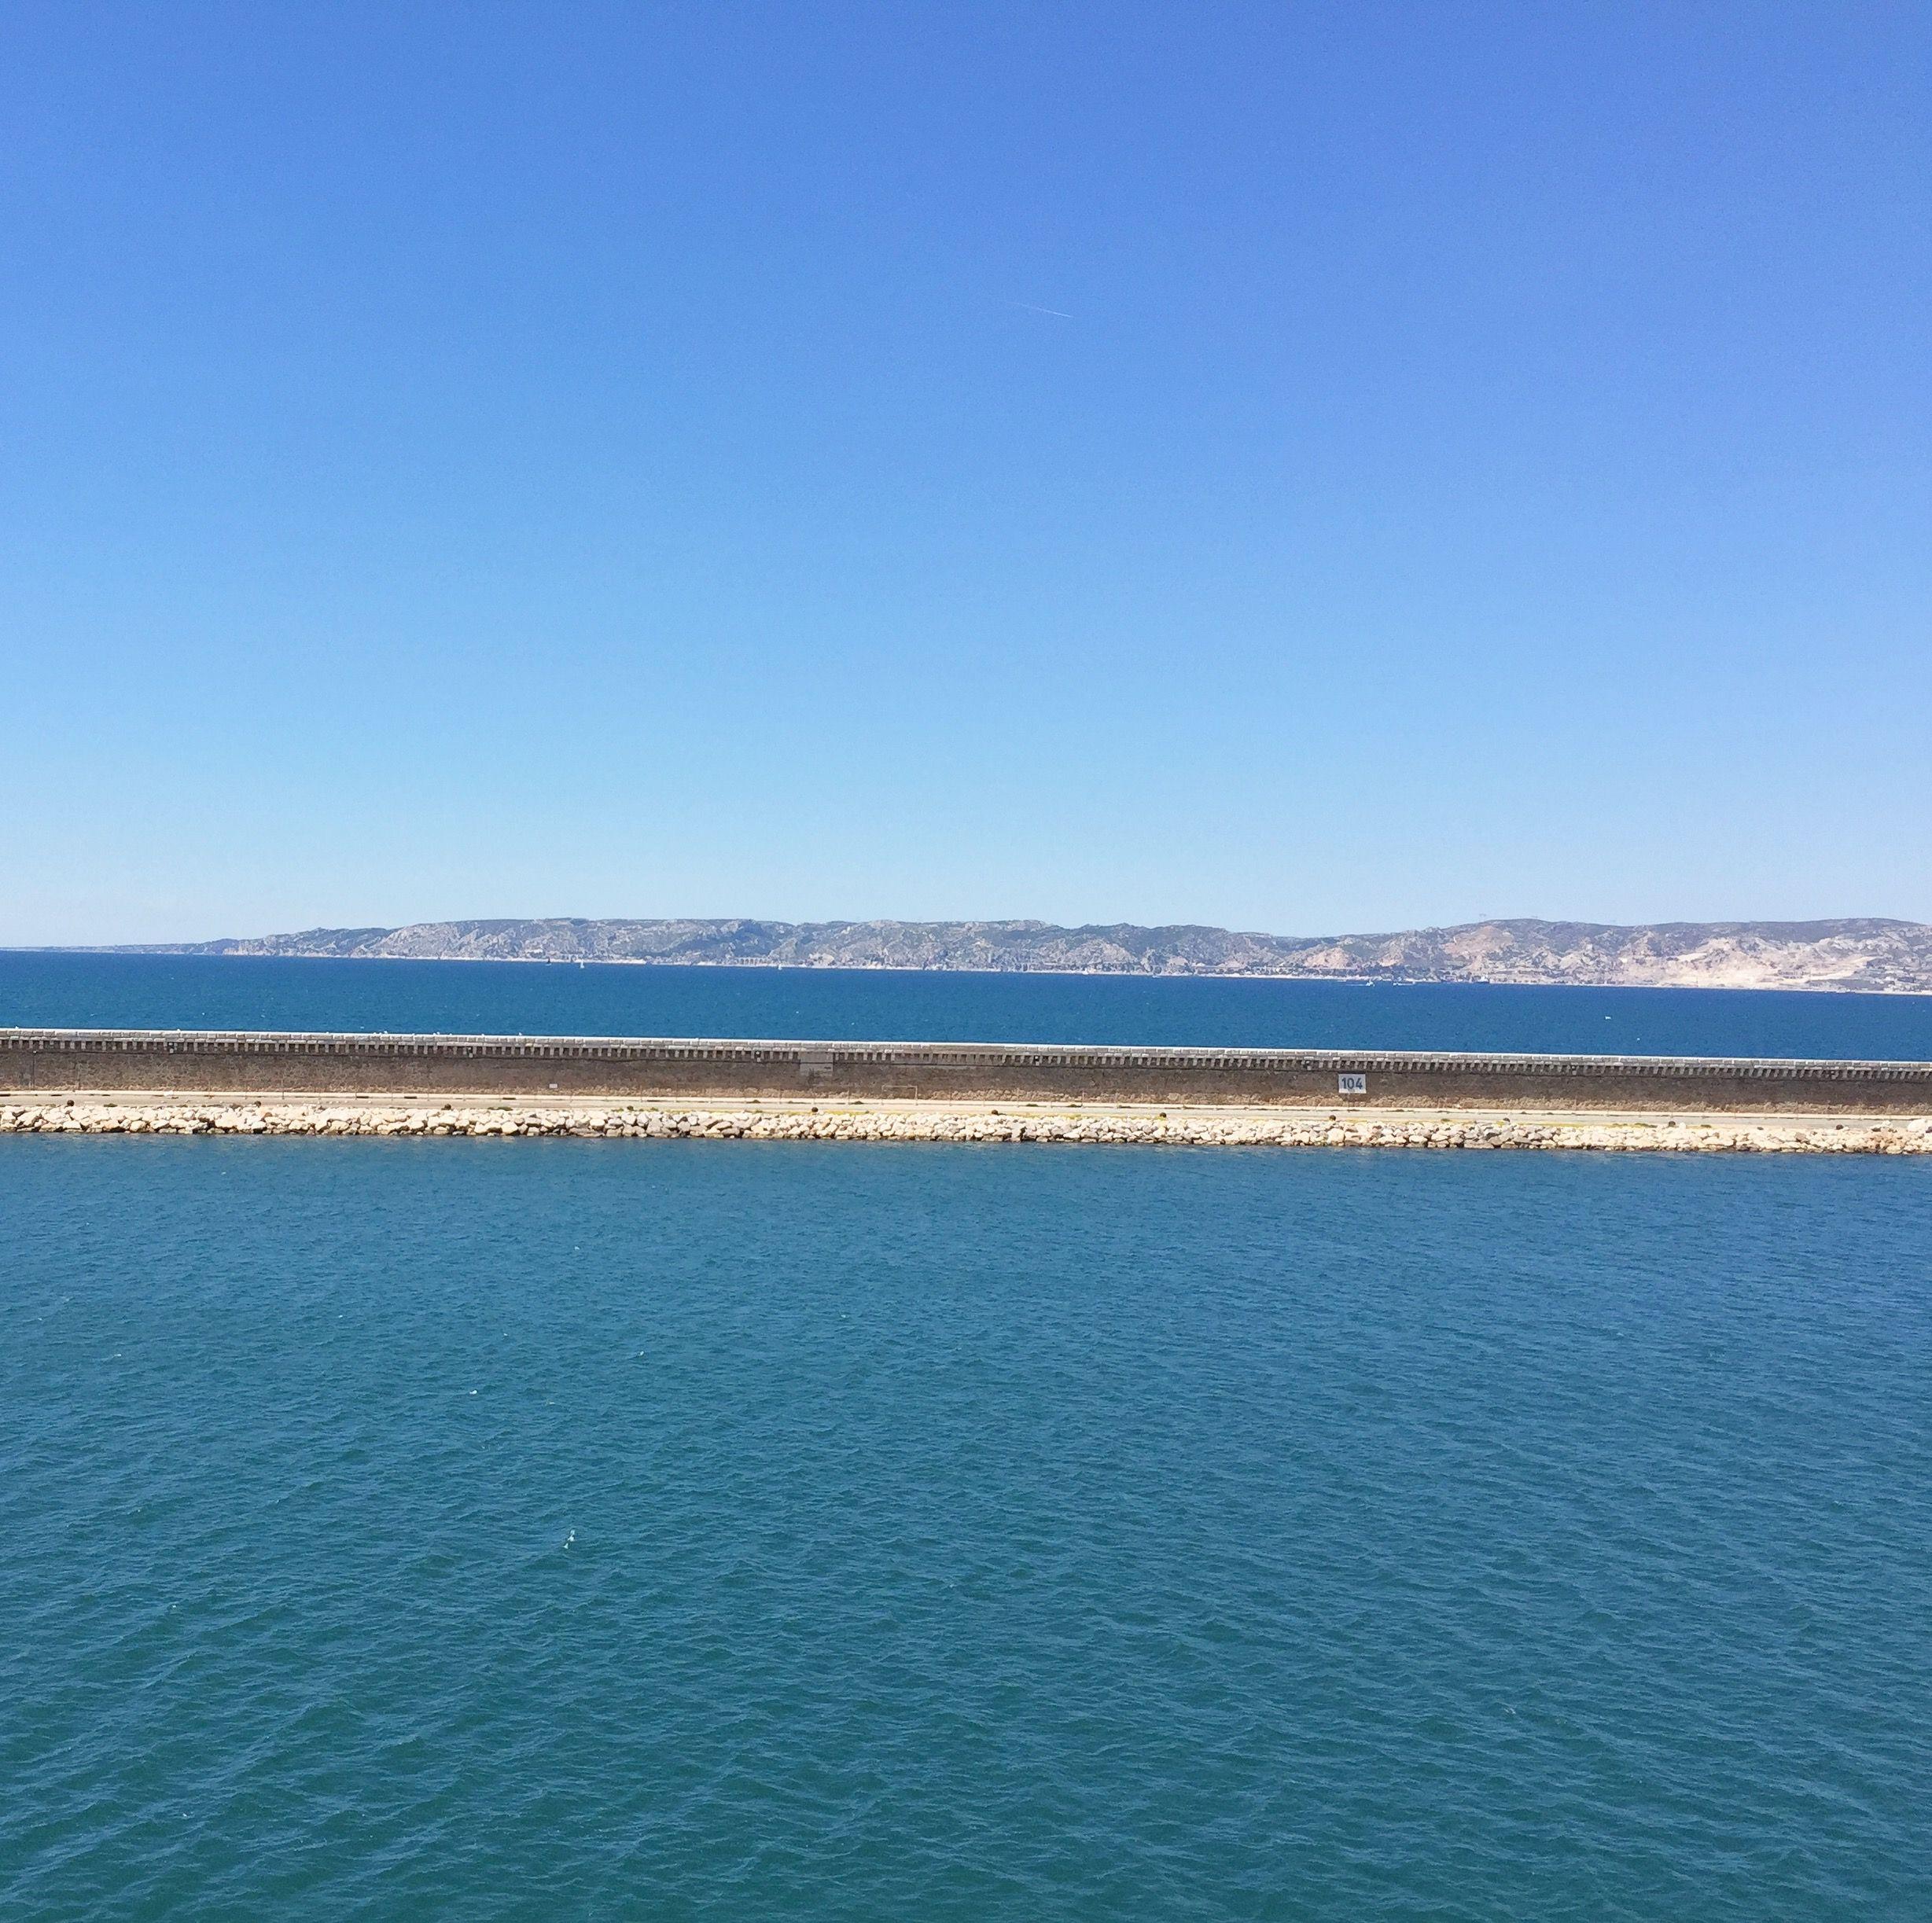 Vapiano les terrasses du port - marseille ! www.soodeco.fr/